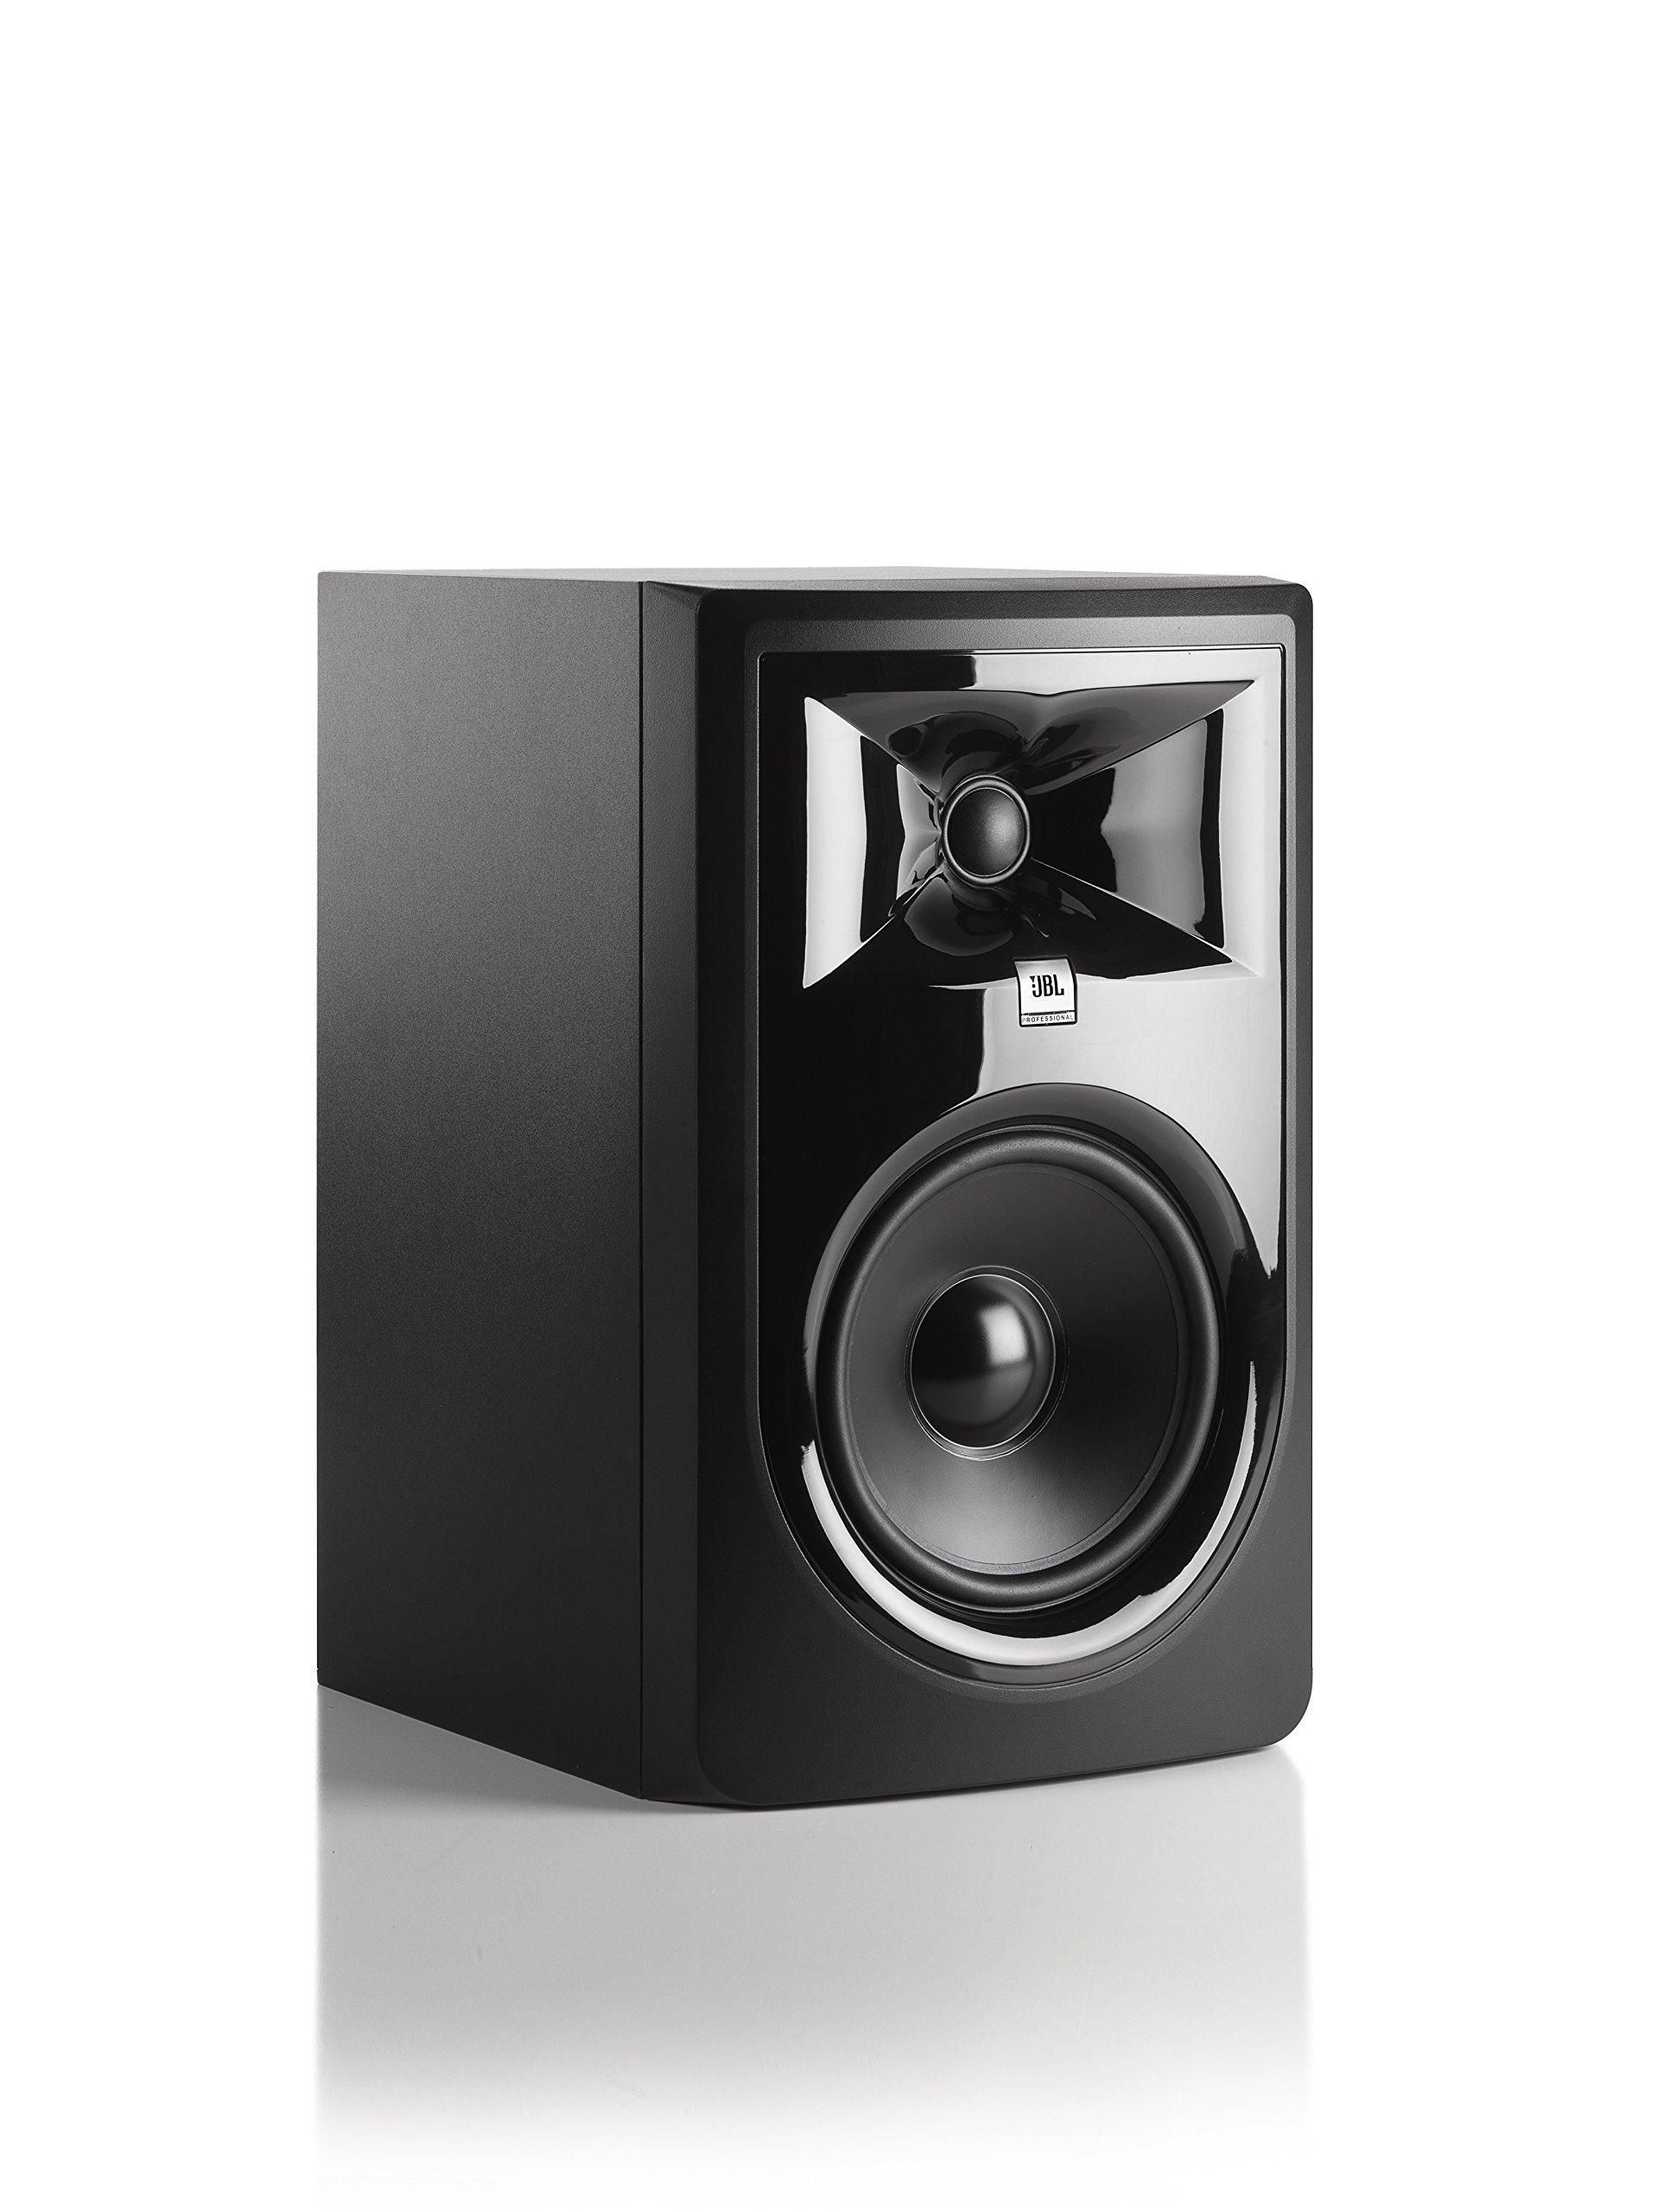 JBL 306P MkII 6'' 2-Way Powered Studio Monitor (new model) by JBL Professional (Image #4)